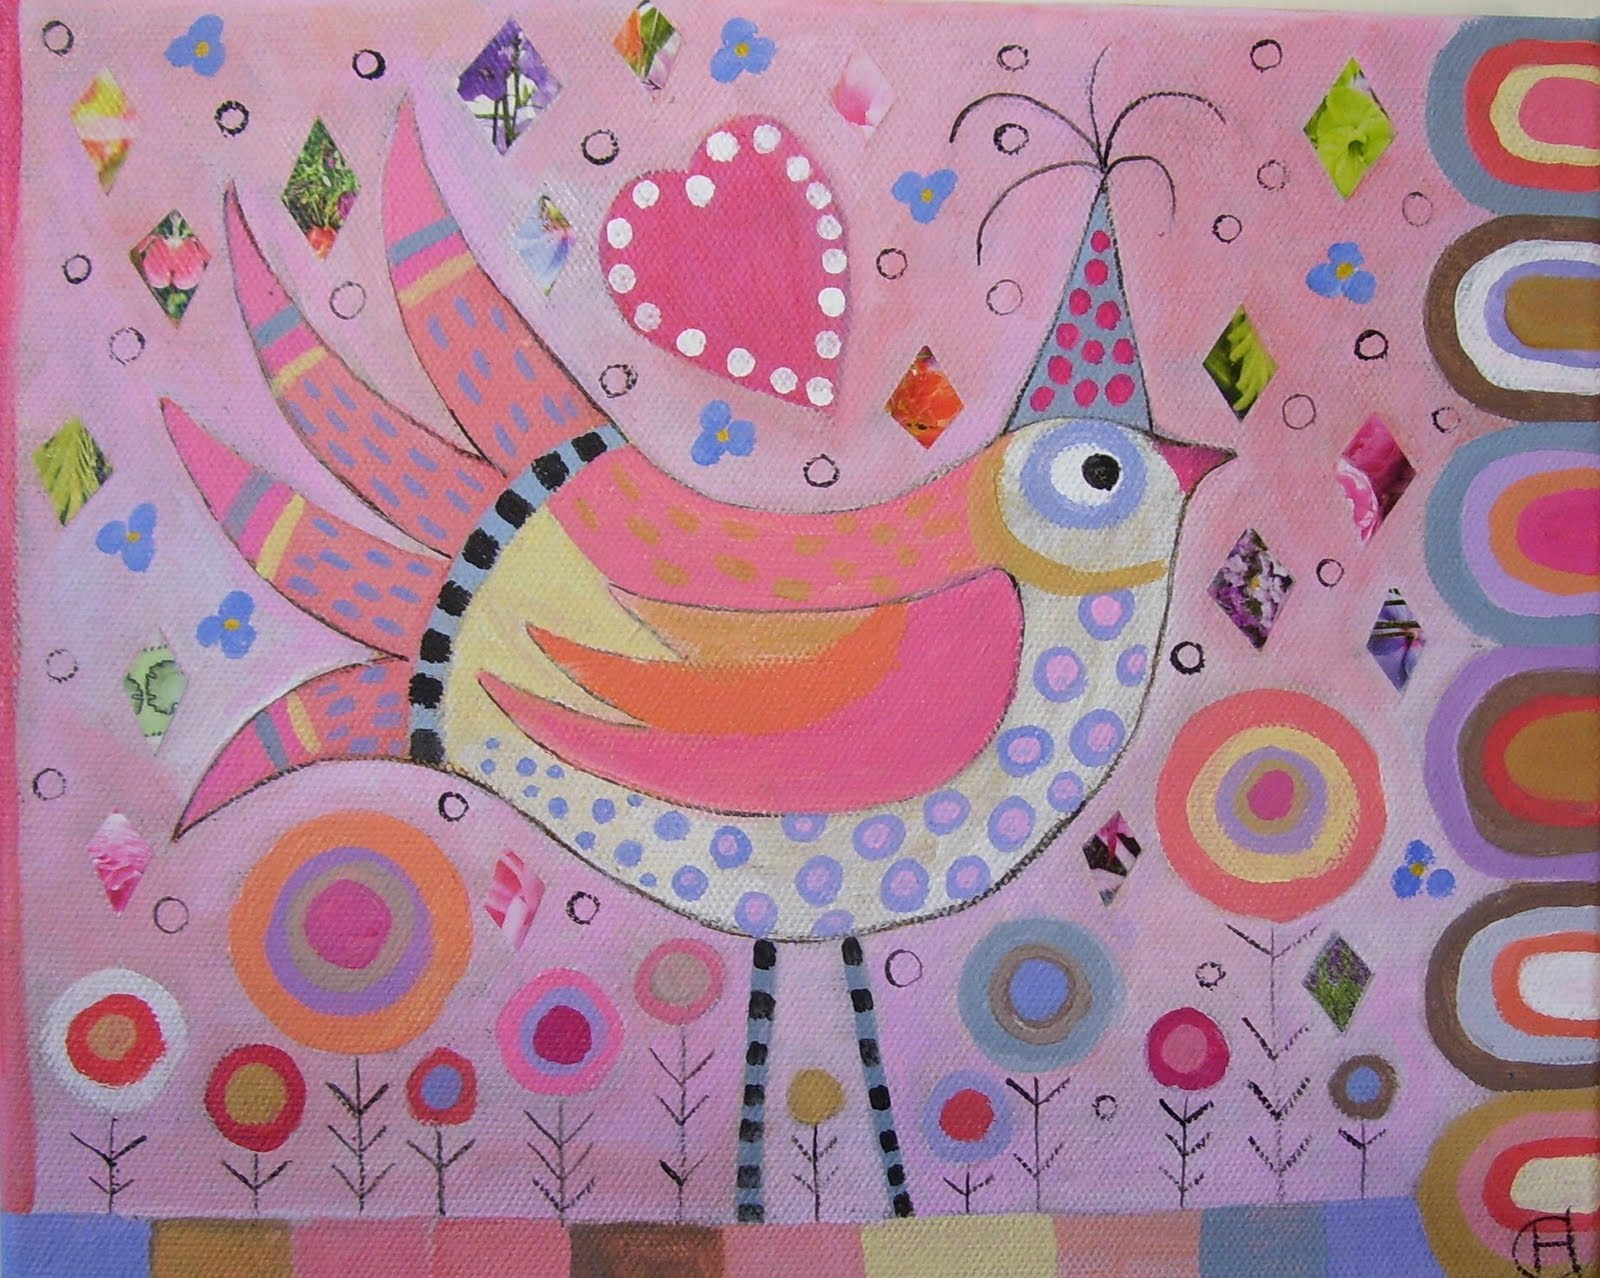 Polykromos Folk Art Bird Painting